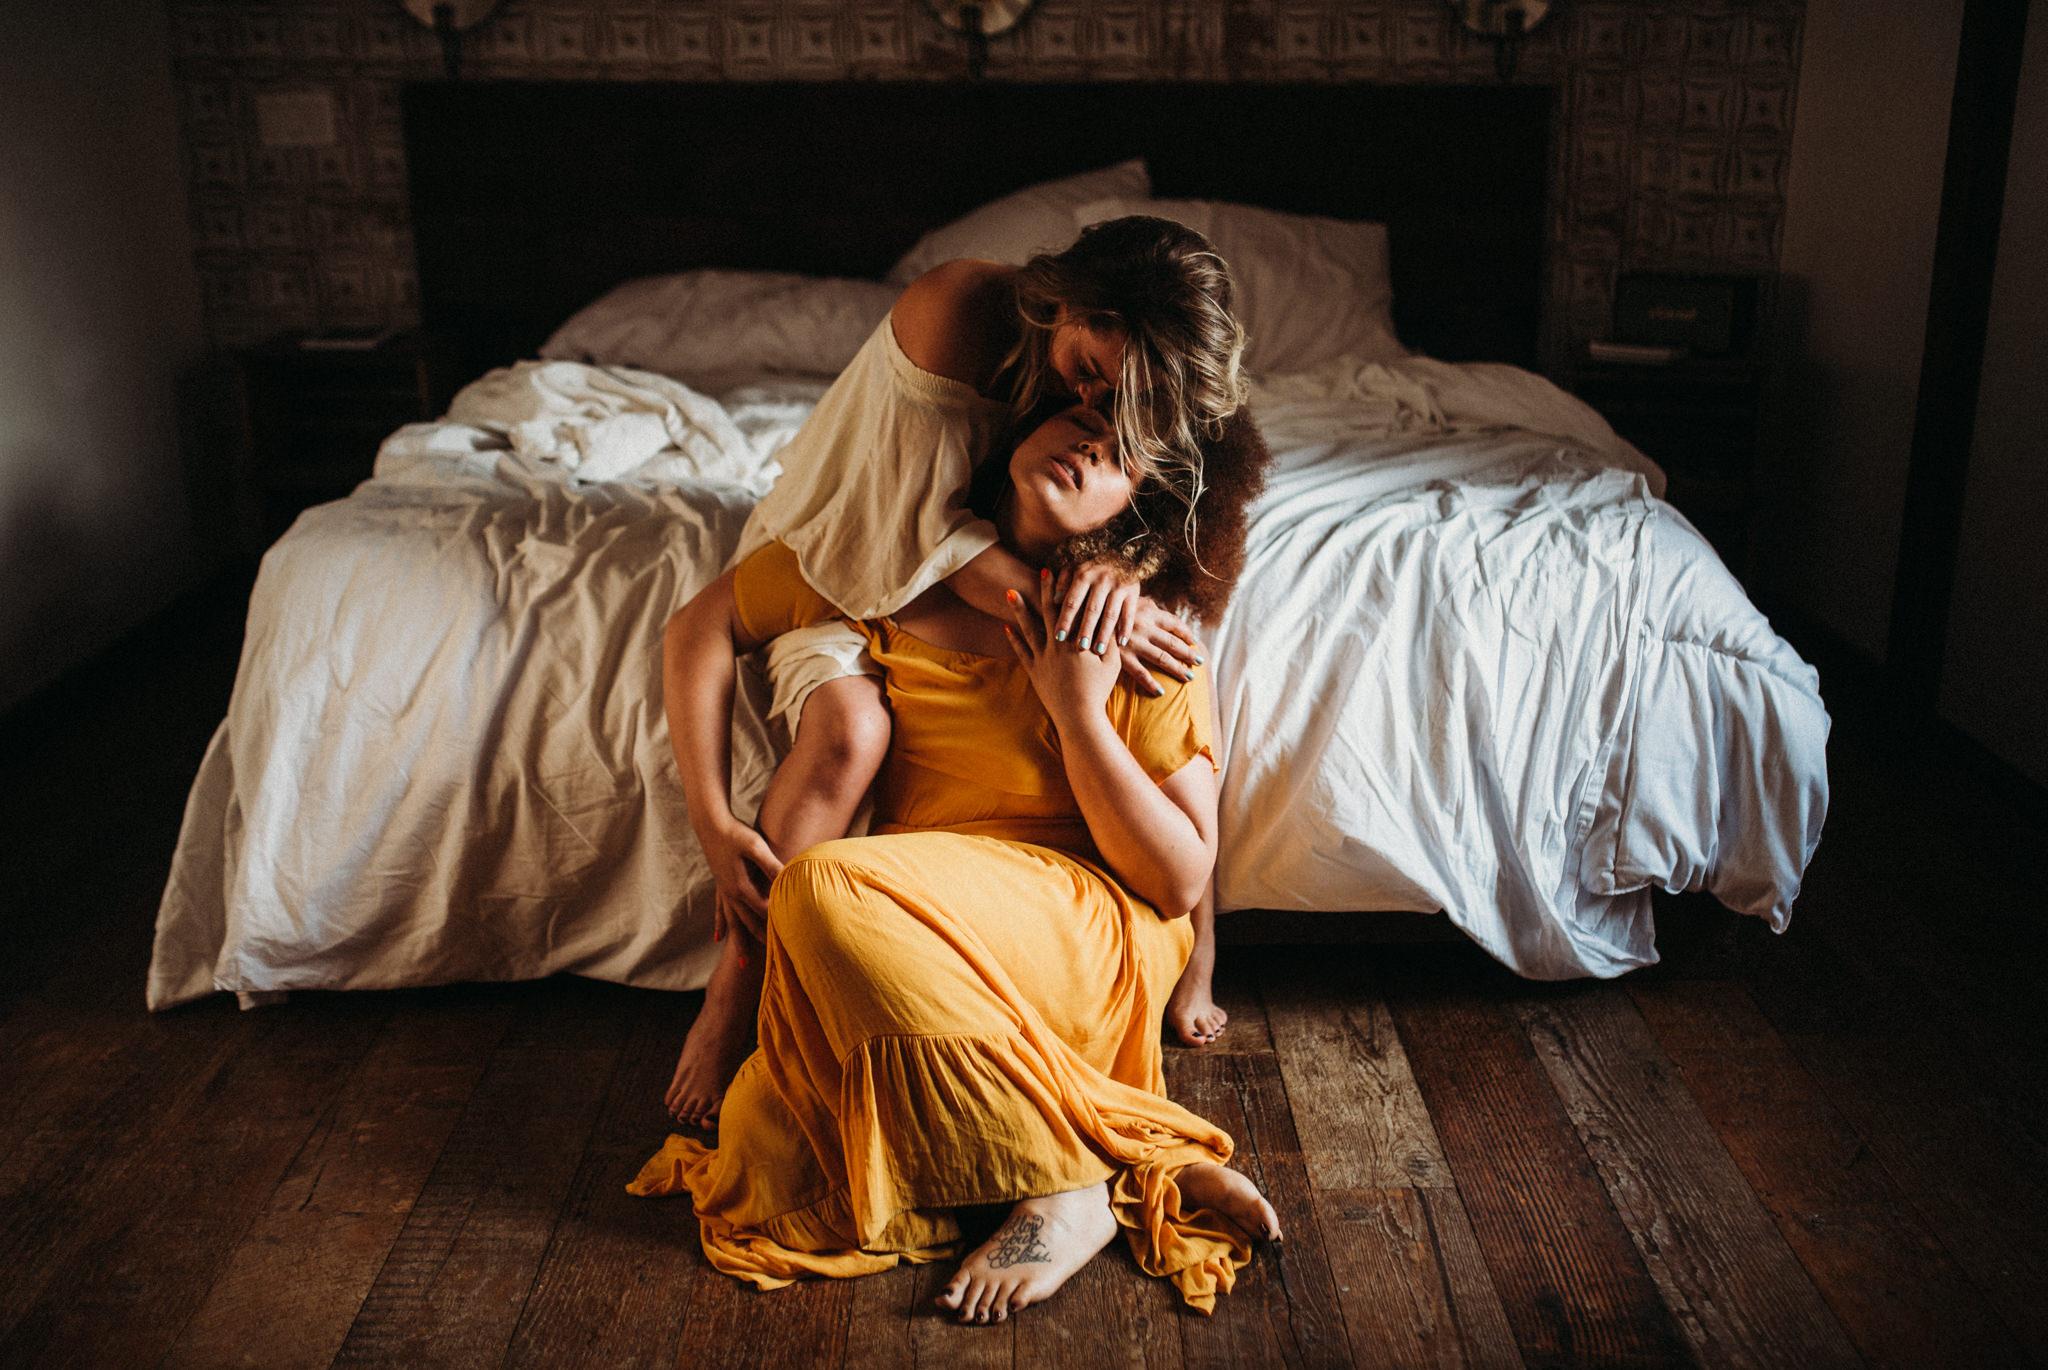 twyla jones photography | www.twylajones.com | intimate in home couples shoot urban cowboy b&b brooklyn new york